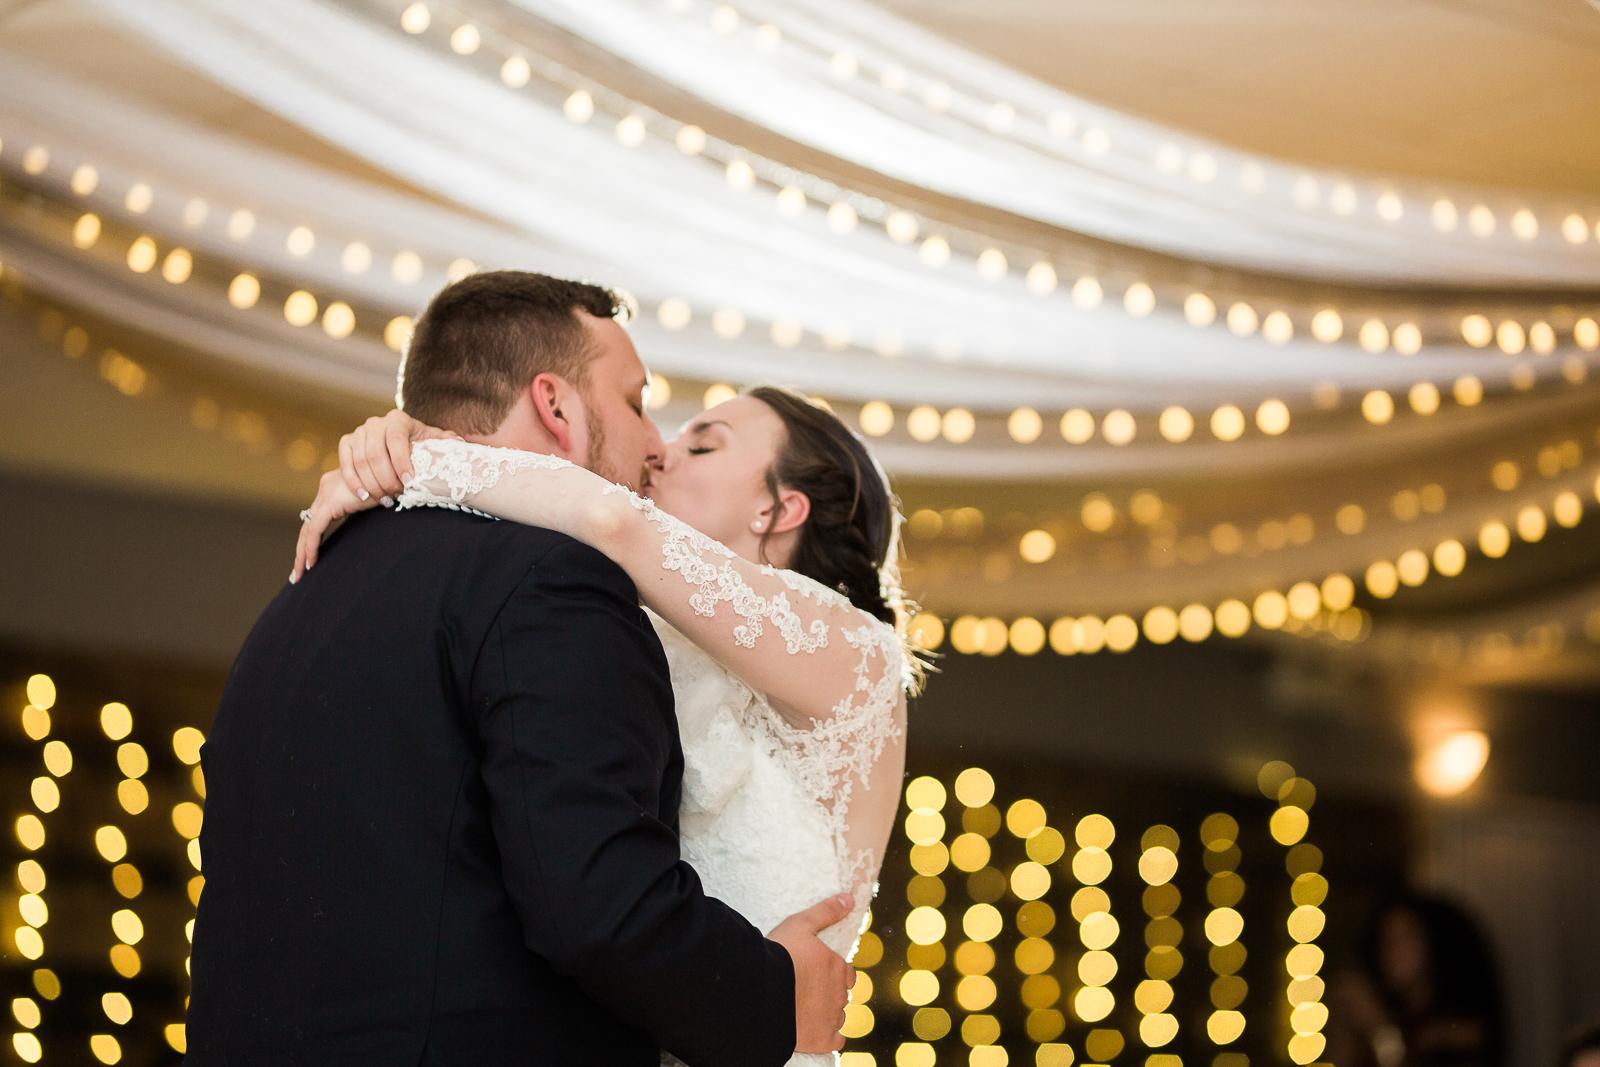 gander-wedding-photographer-143.jpg